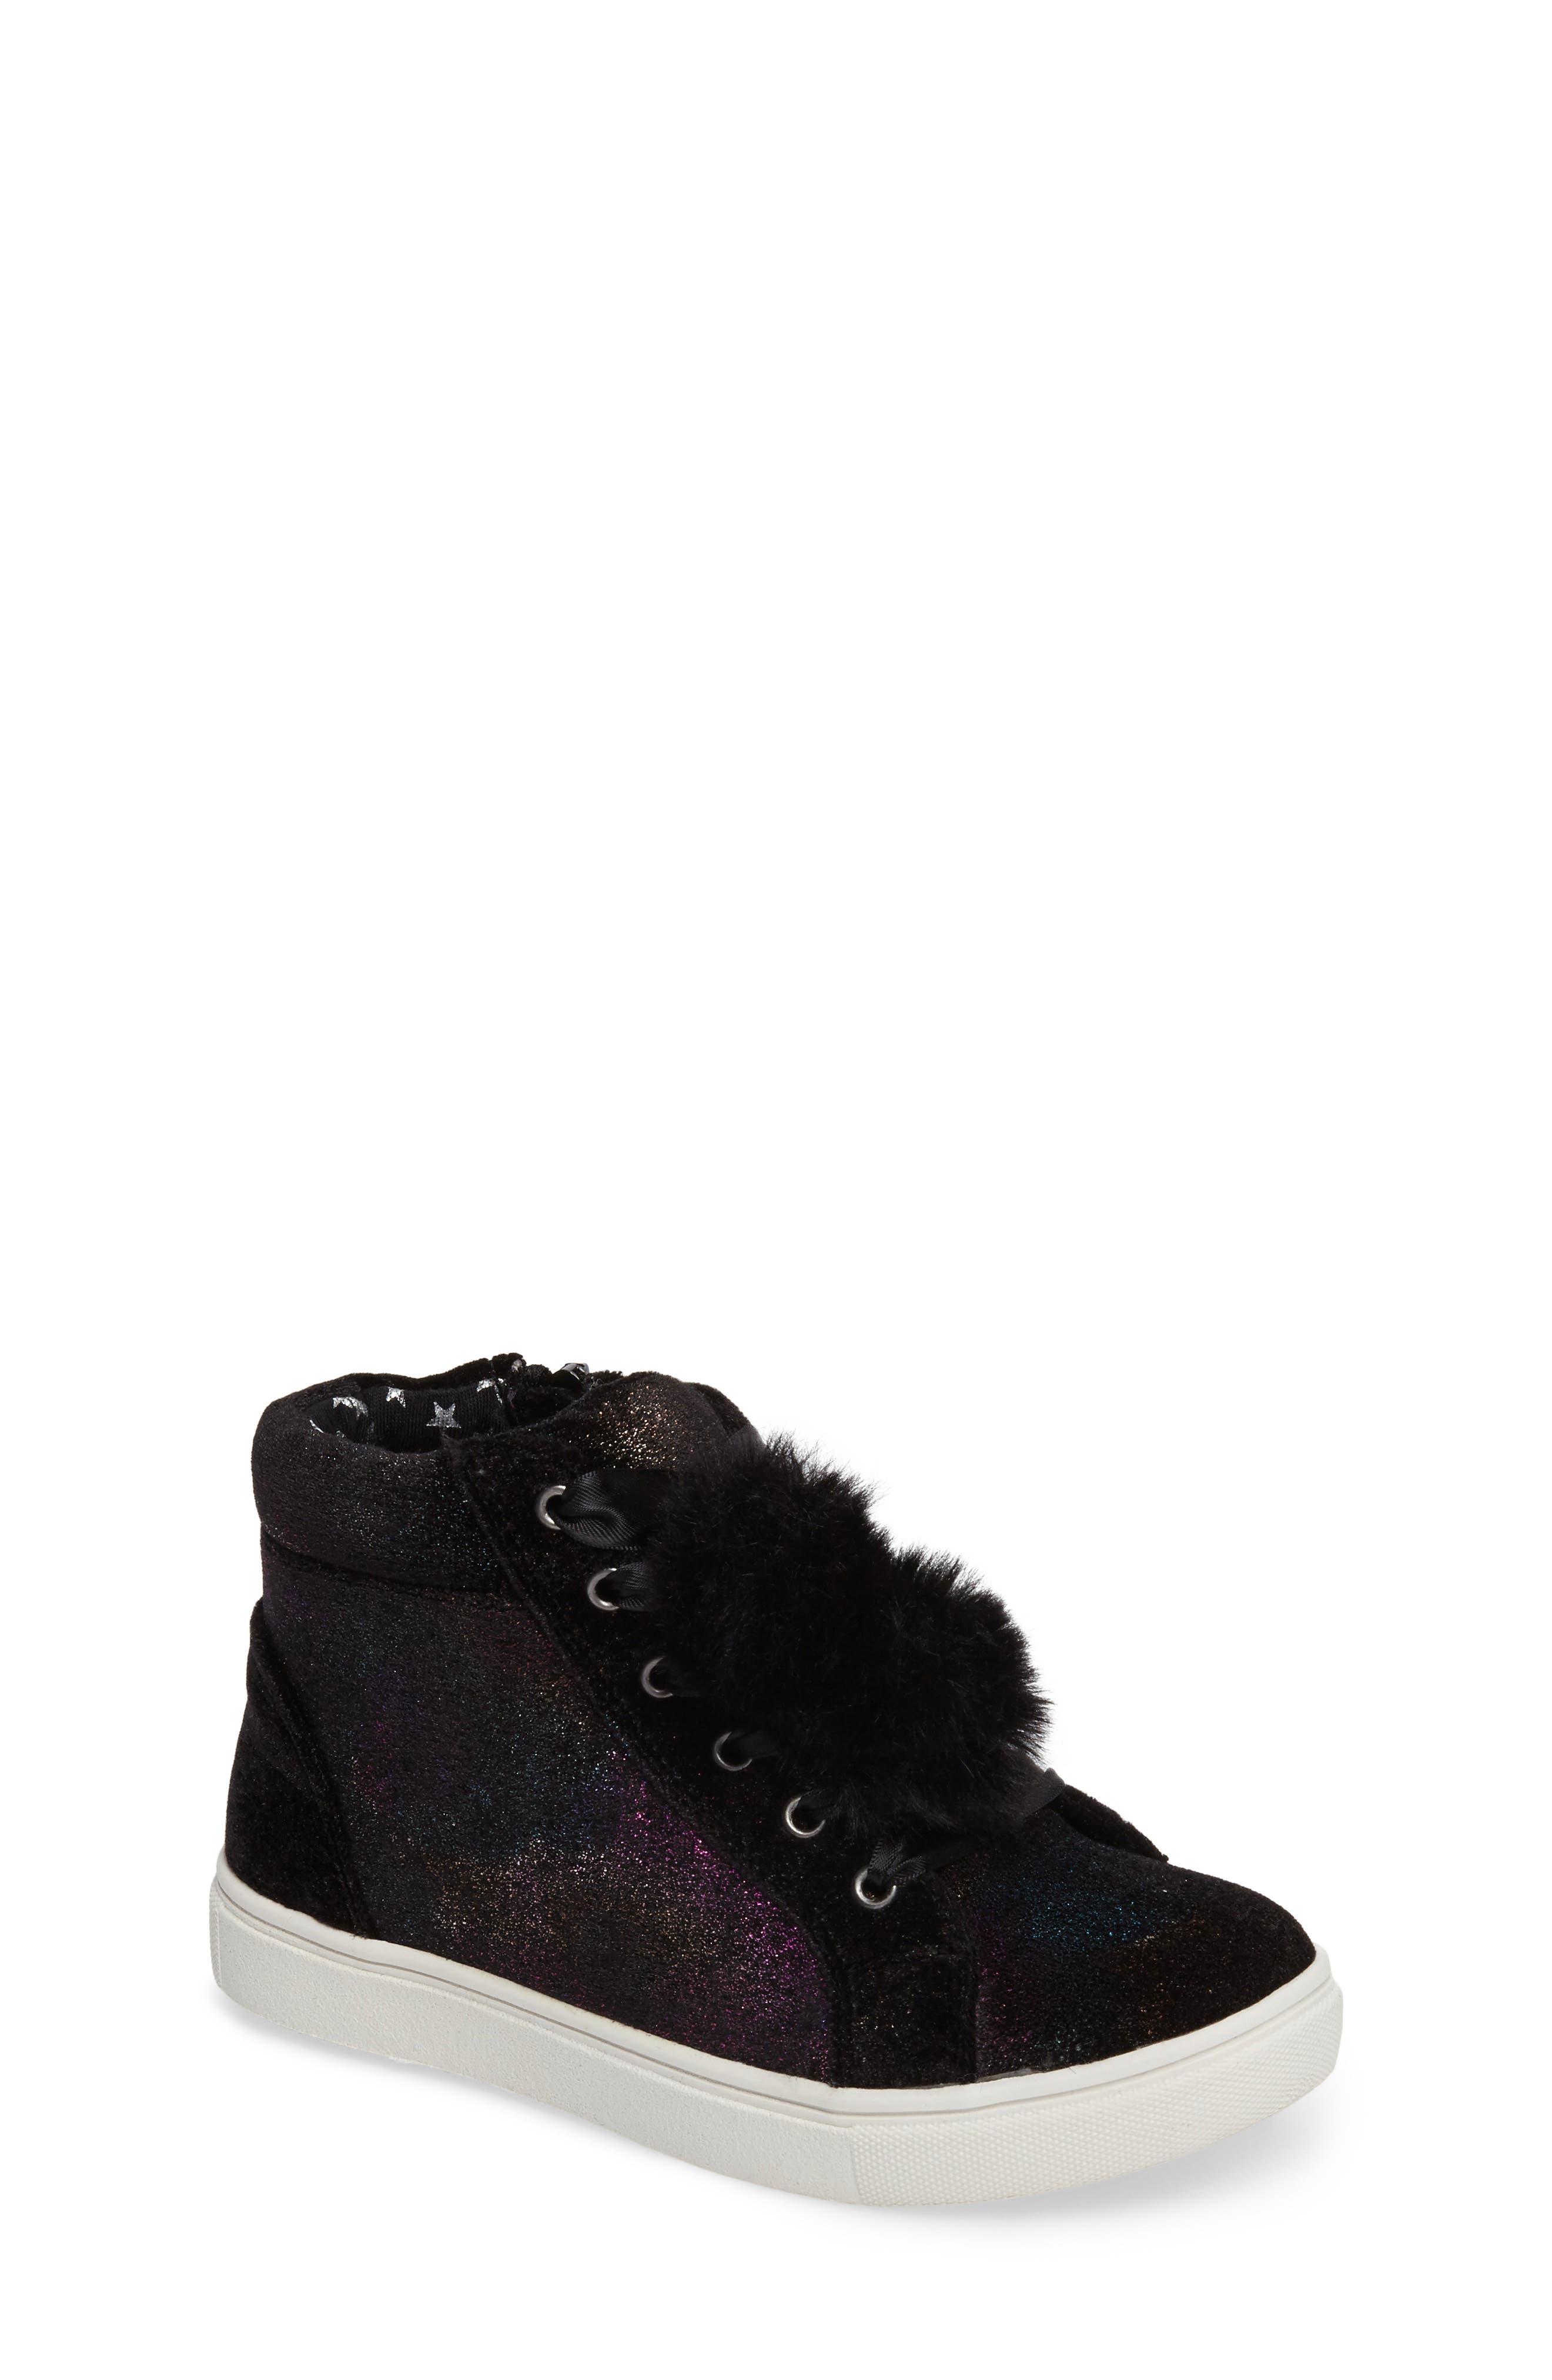 Alternate Image 1 Selected - Steve Madden JBrielle High Top Sneaker (Little Kid & Big Kid)